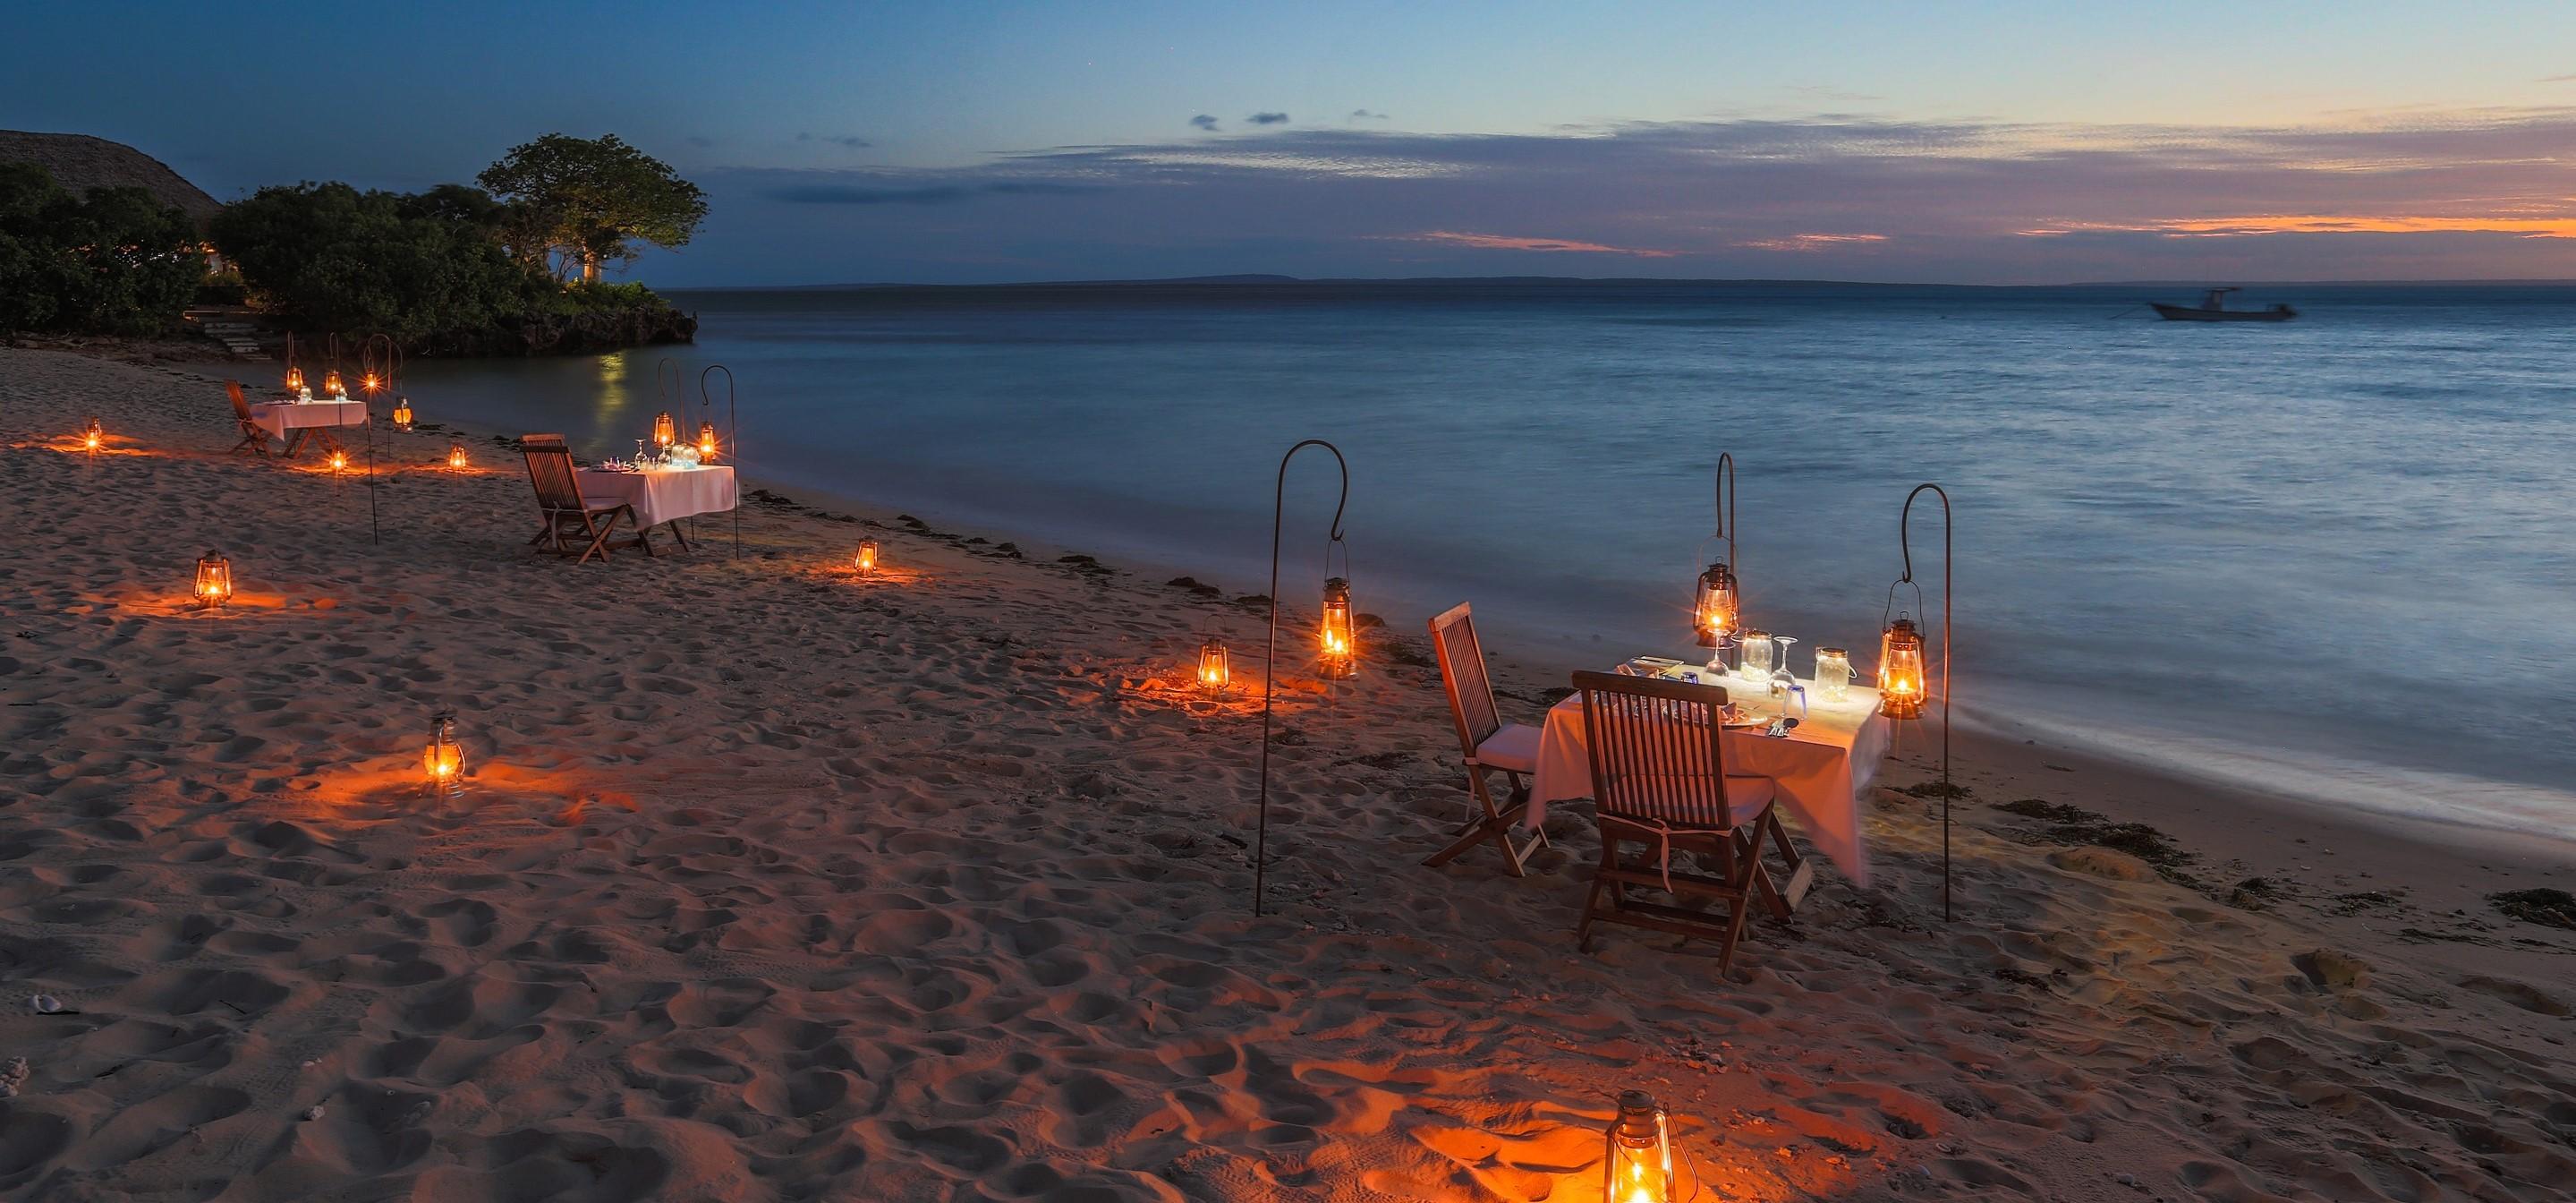 azura_quilalea_dining_on_beach